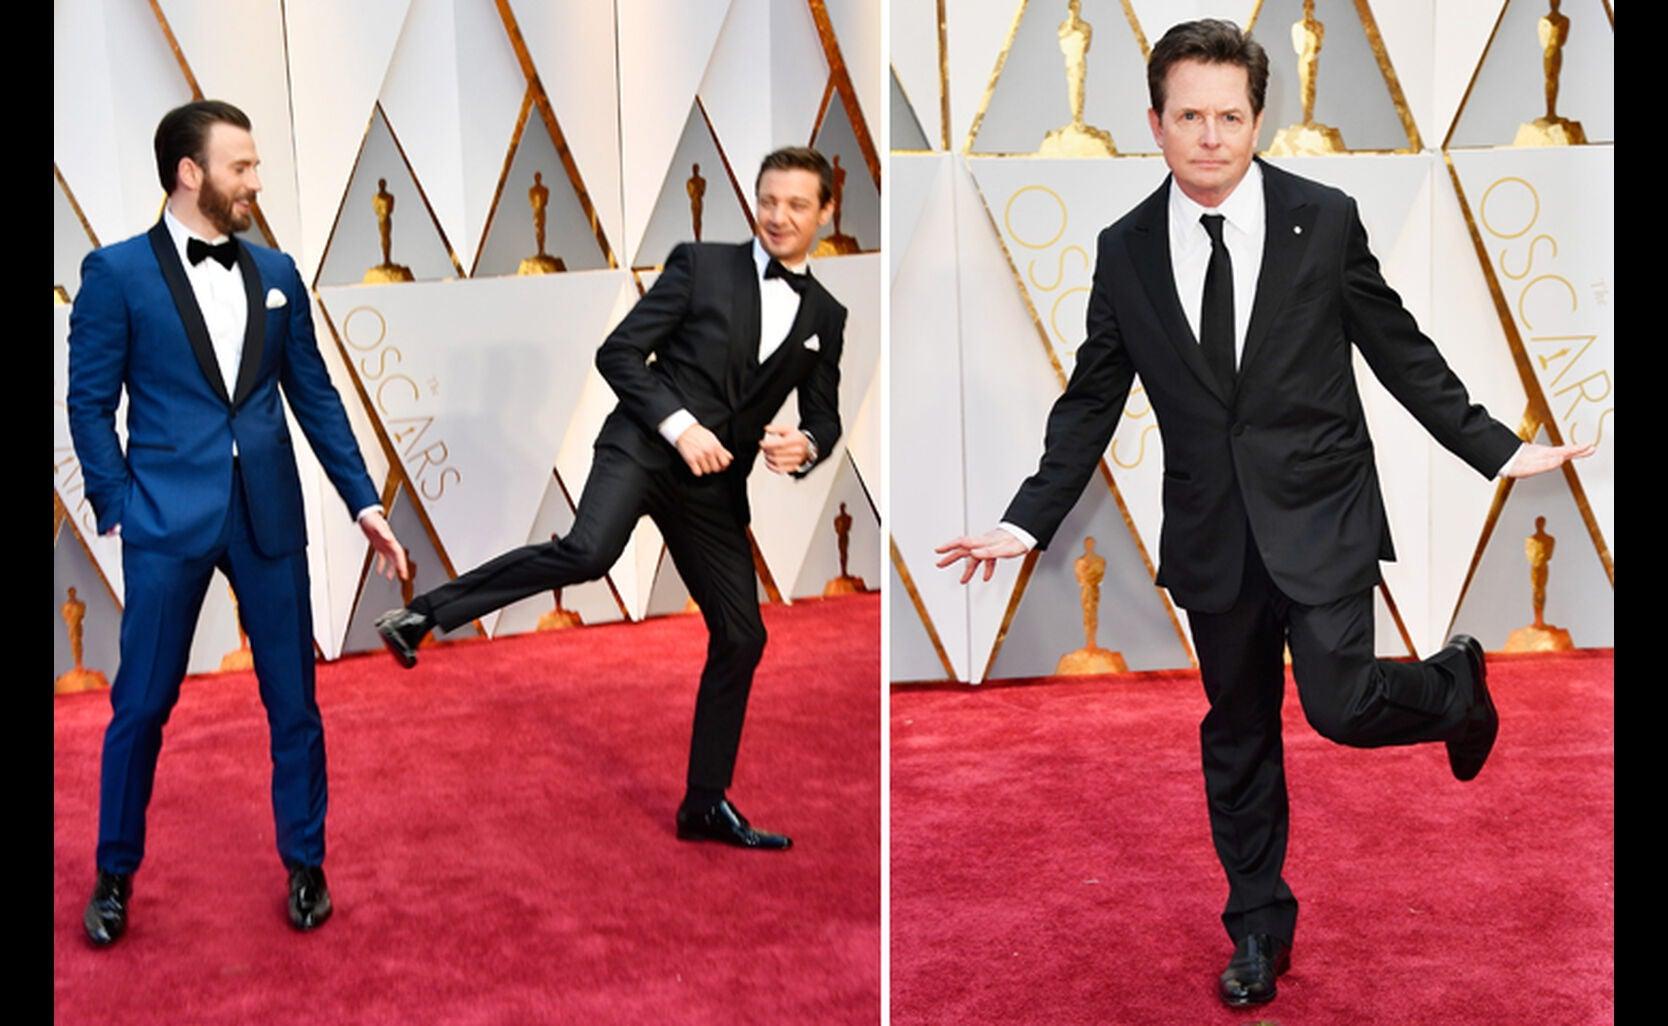 Chris Evans, Jeremy Renner and Michael J. Fox